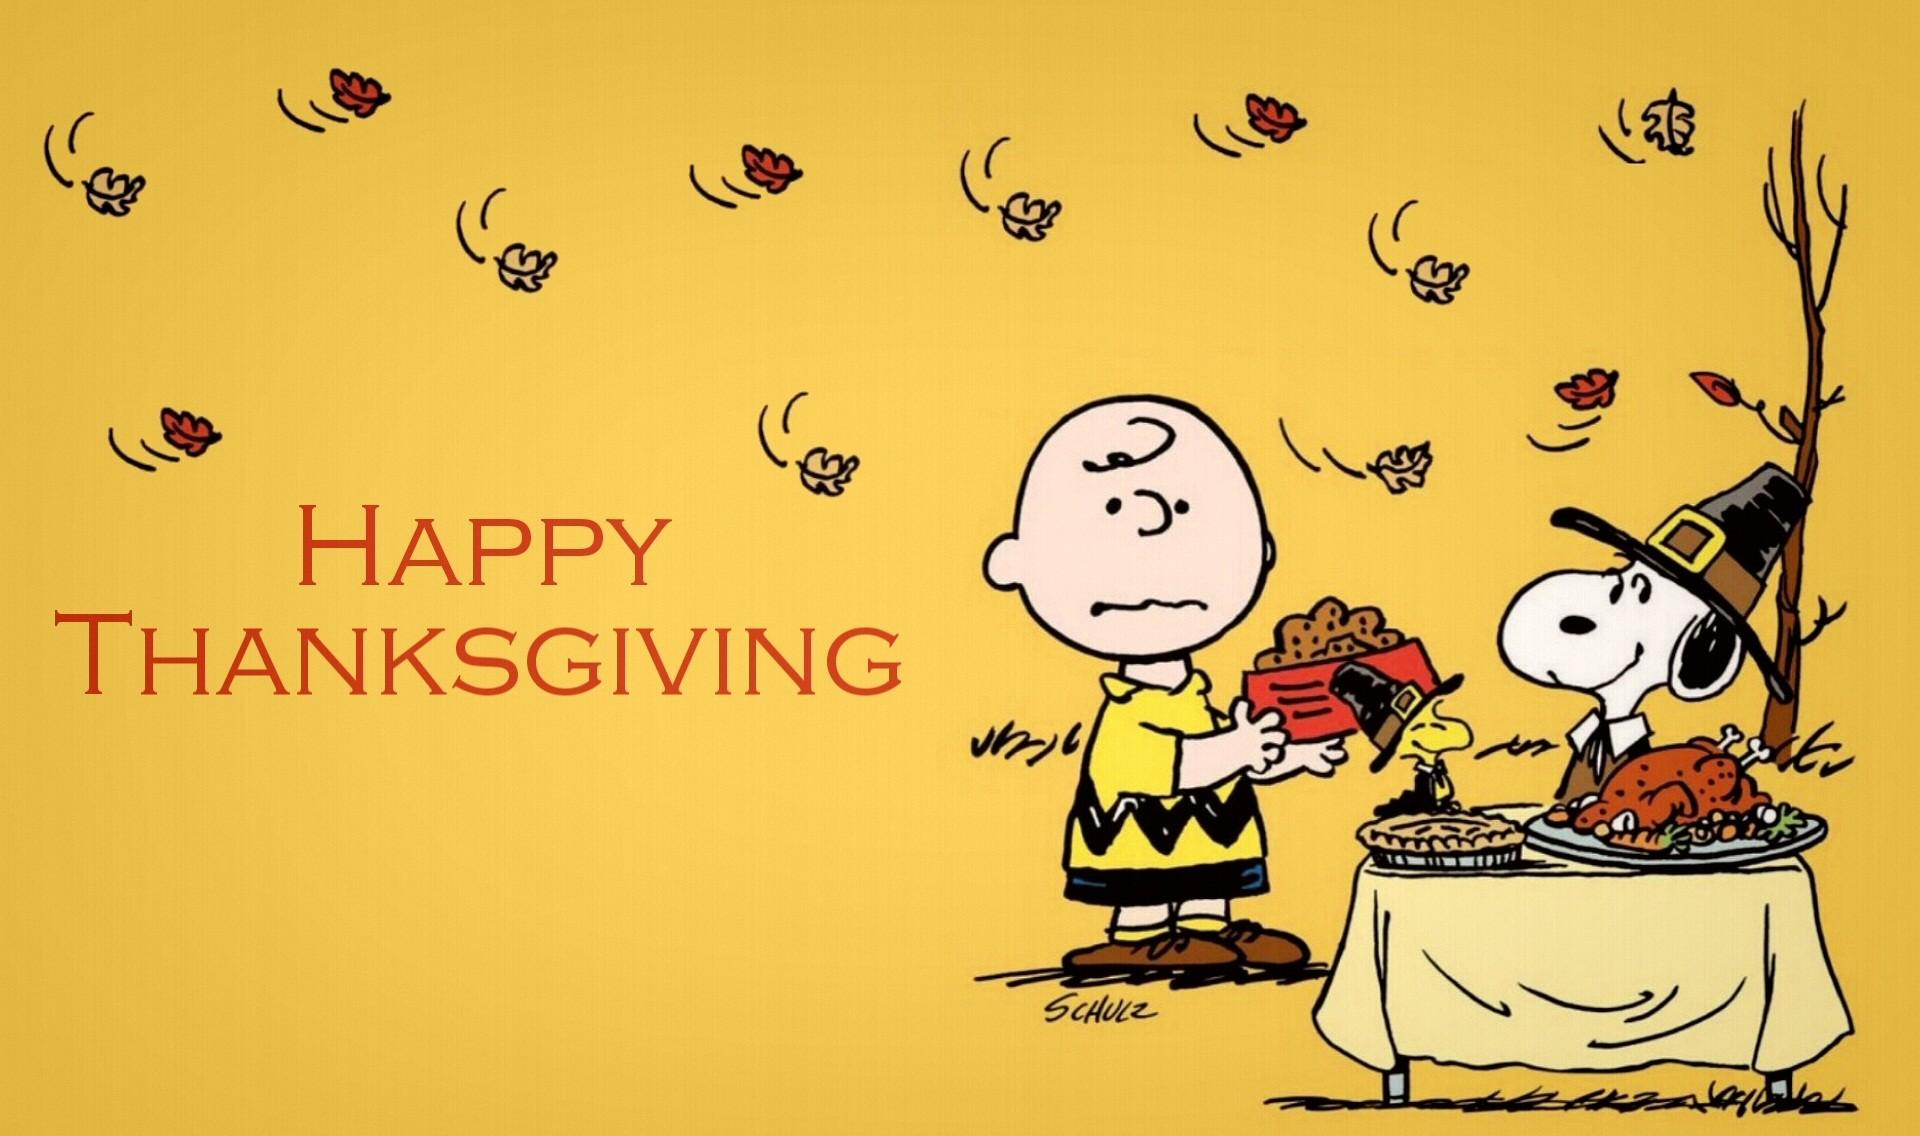 Snoopy Winter Wallpaper Thanksgiving Snoopy Wallpaper